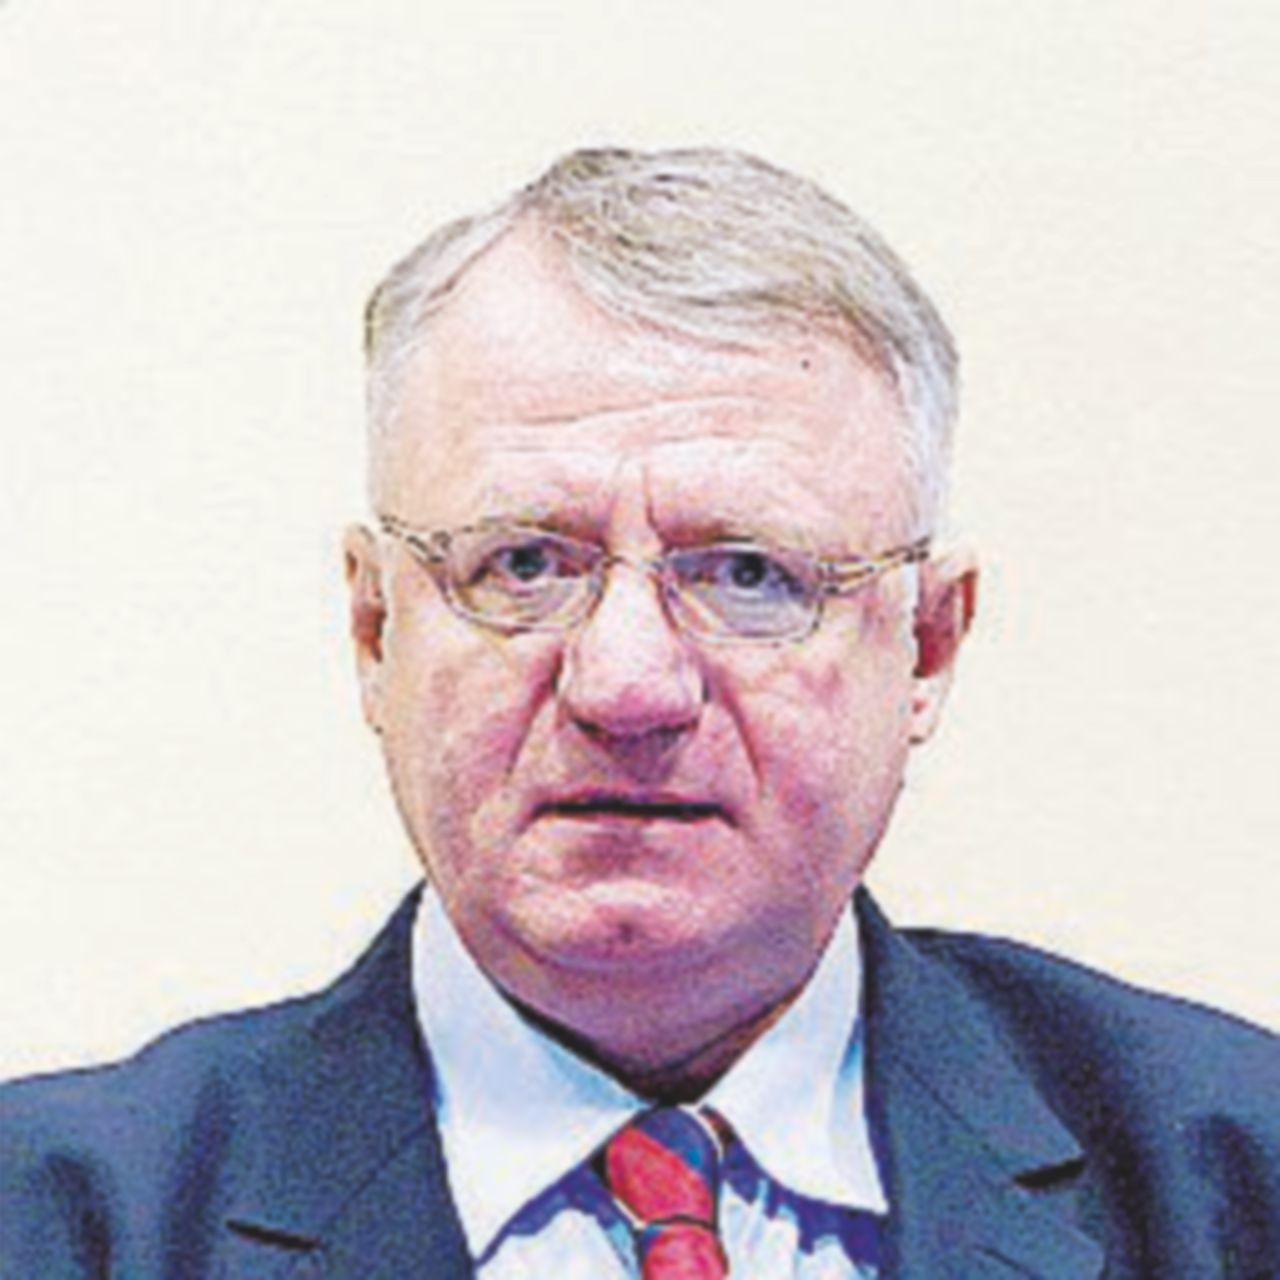 L'ultra-serbo Seselj assolto all'Aja, rabbia balcanica